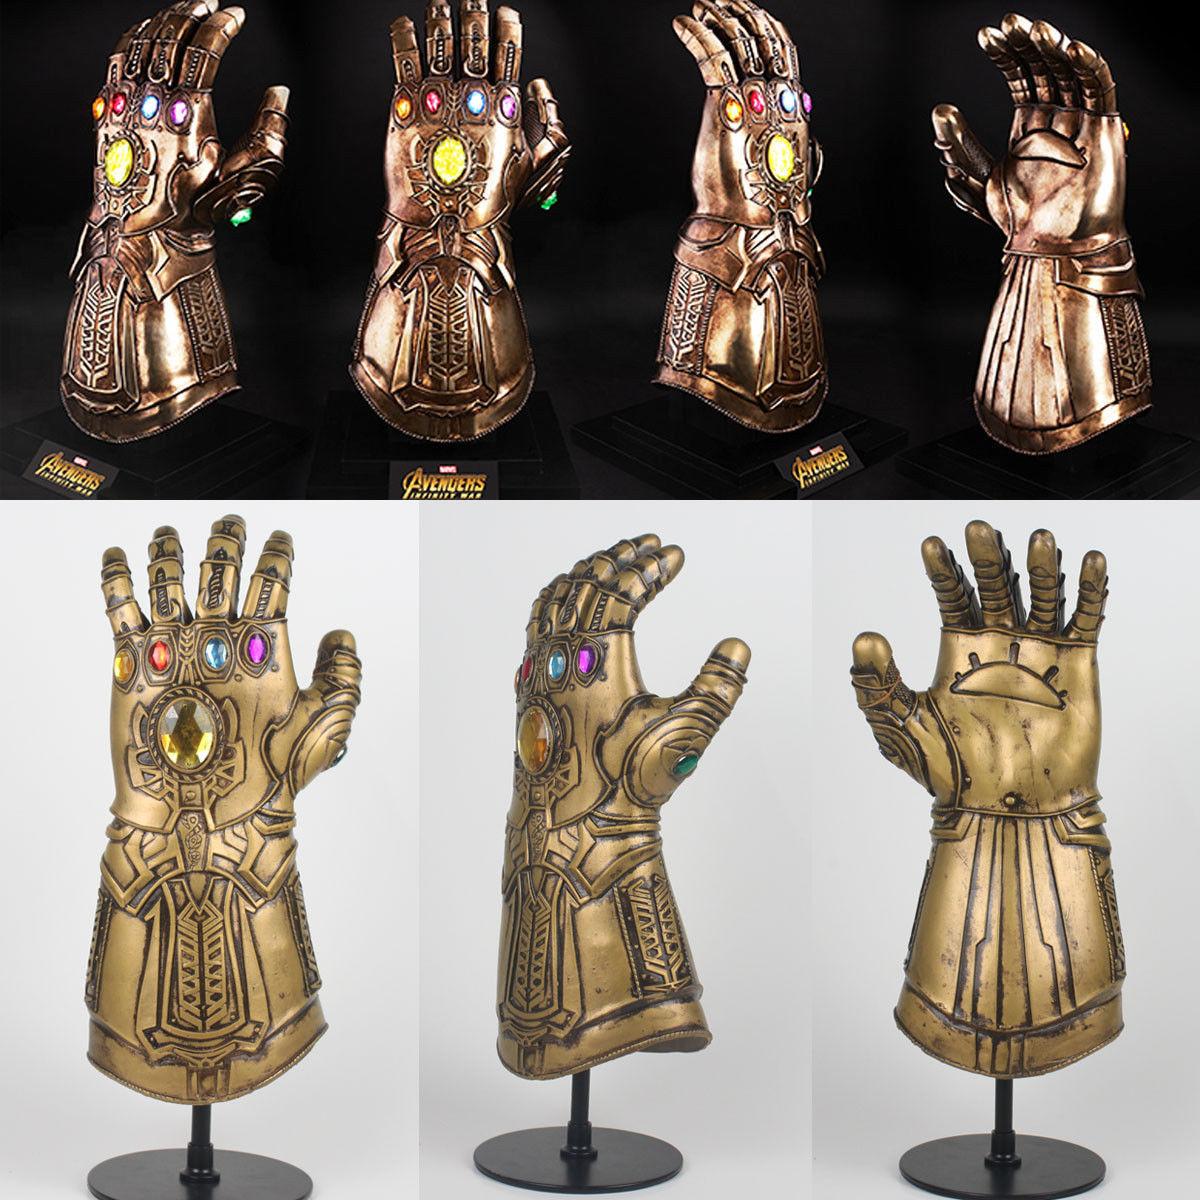 Thanos Infinity Gauntlet Glove Cosplay 2018 Infinity War The Avengers Prop - $36.79